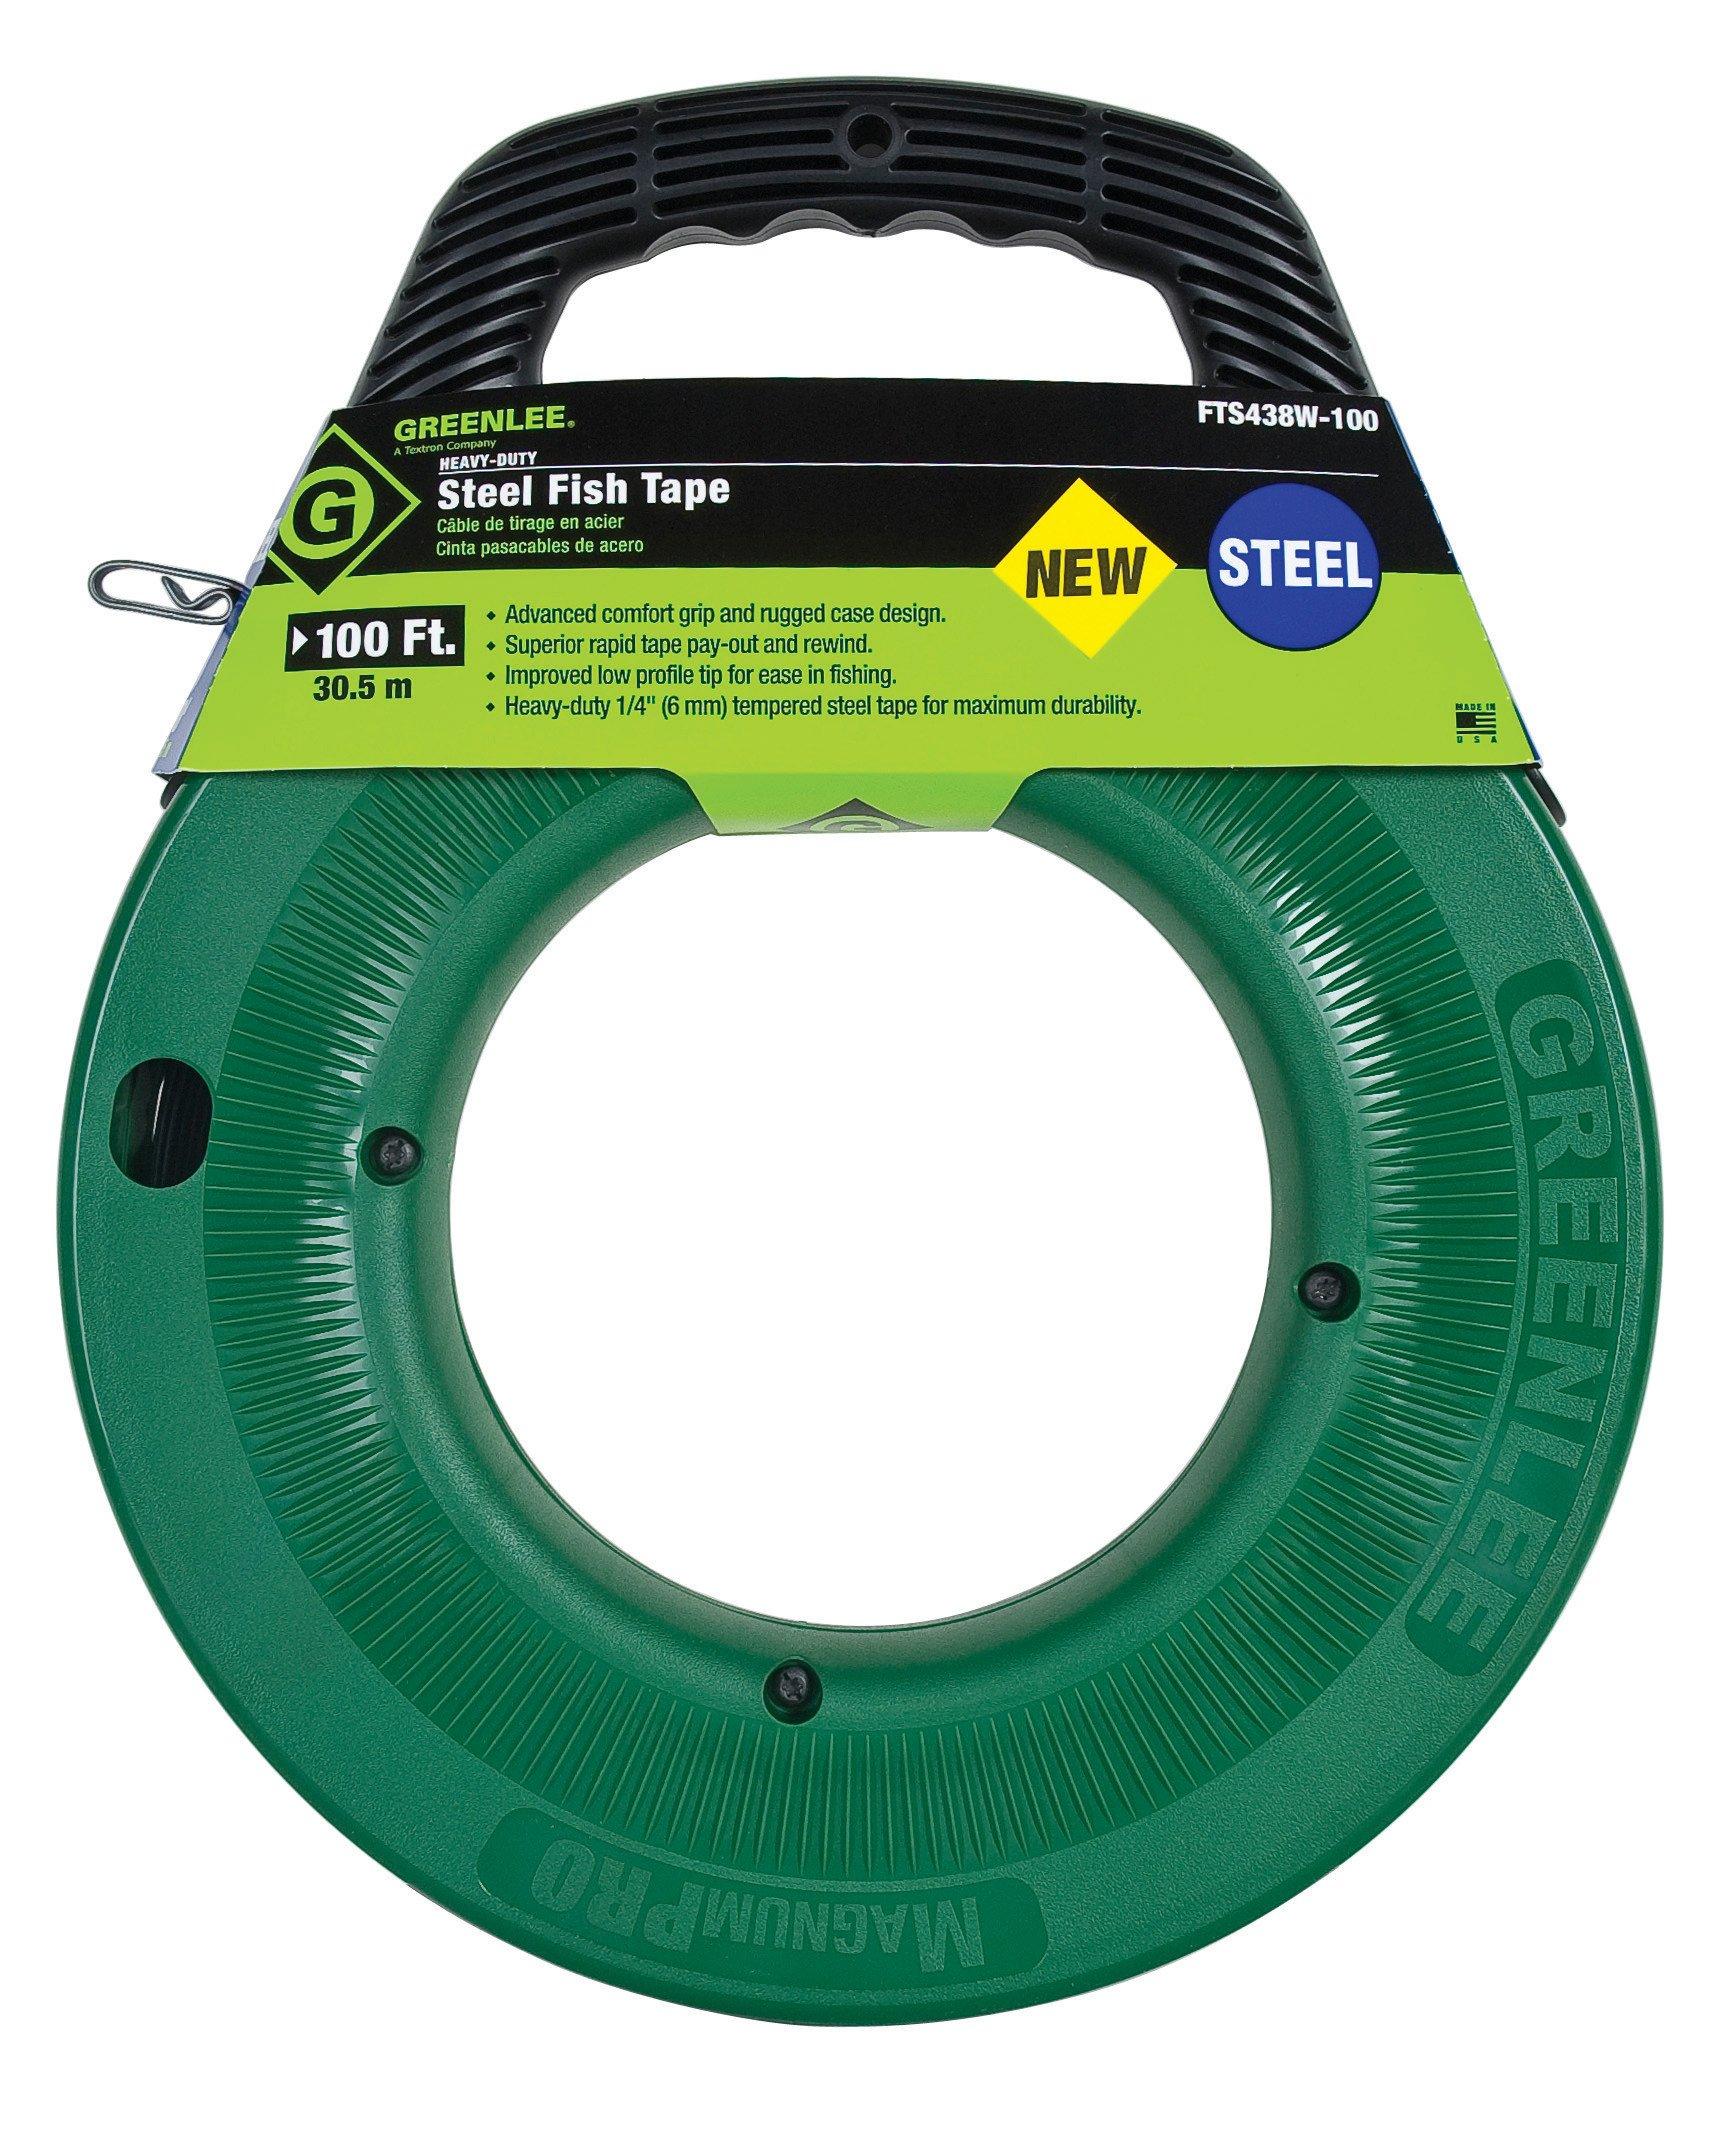 Greenlee FTS438W-100 100-Feet x 1/4-Inch Steel Fish Tape